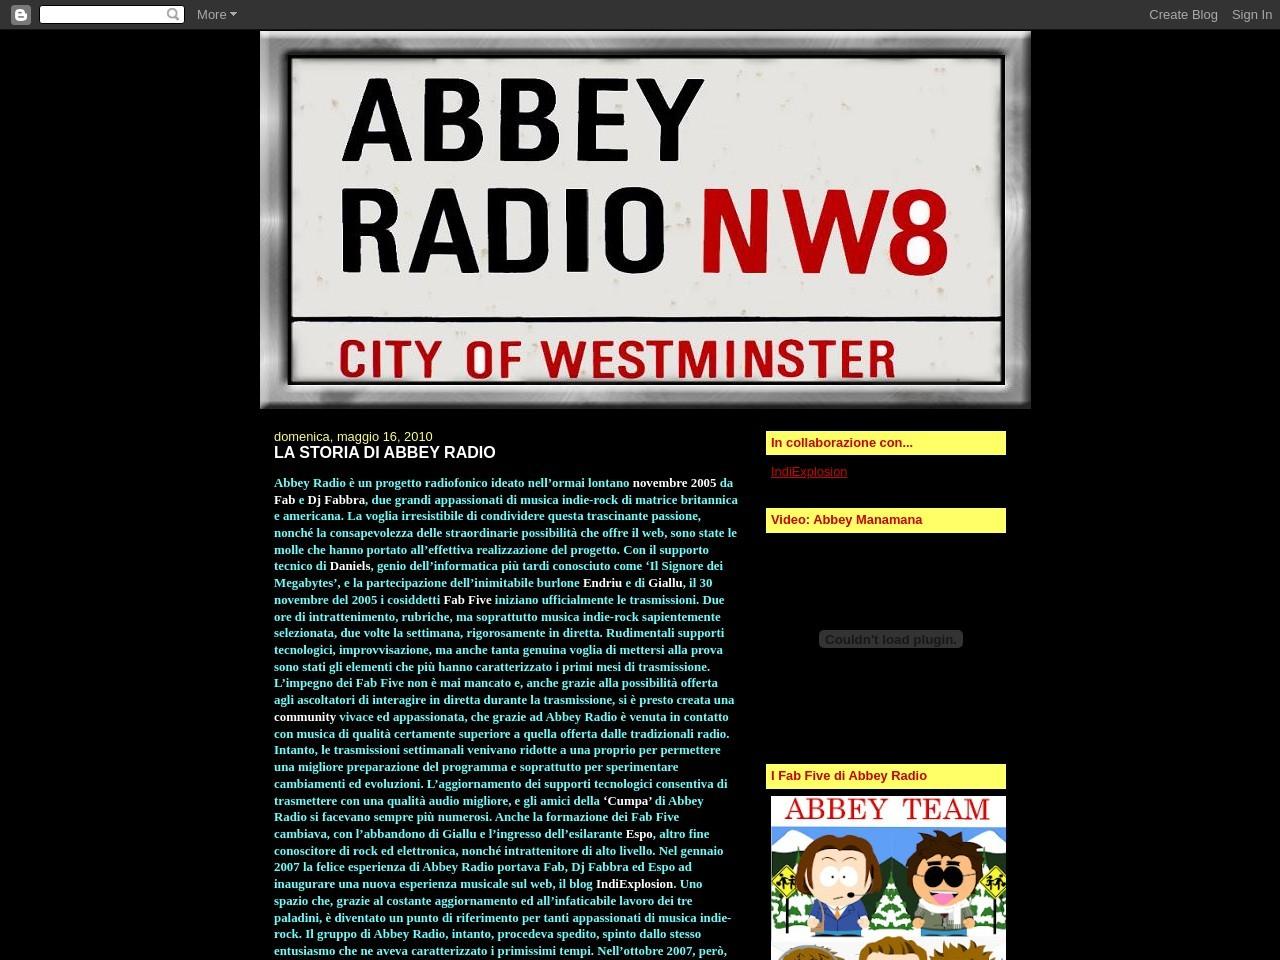 abbey-radio